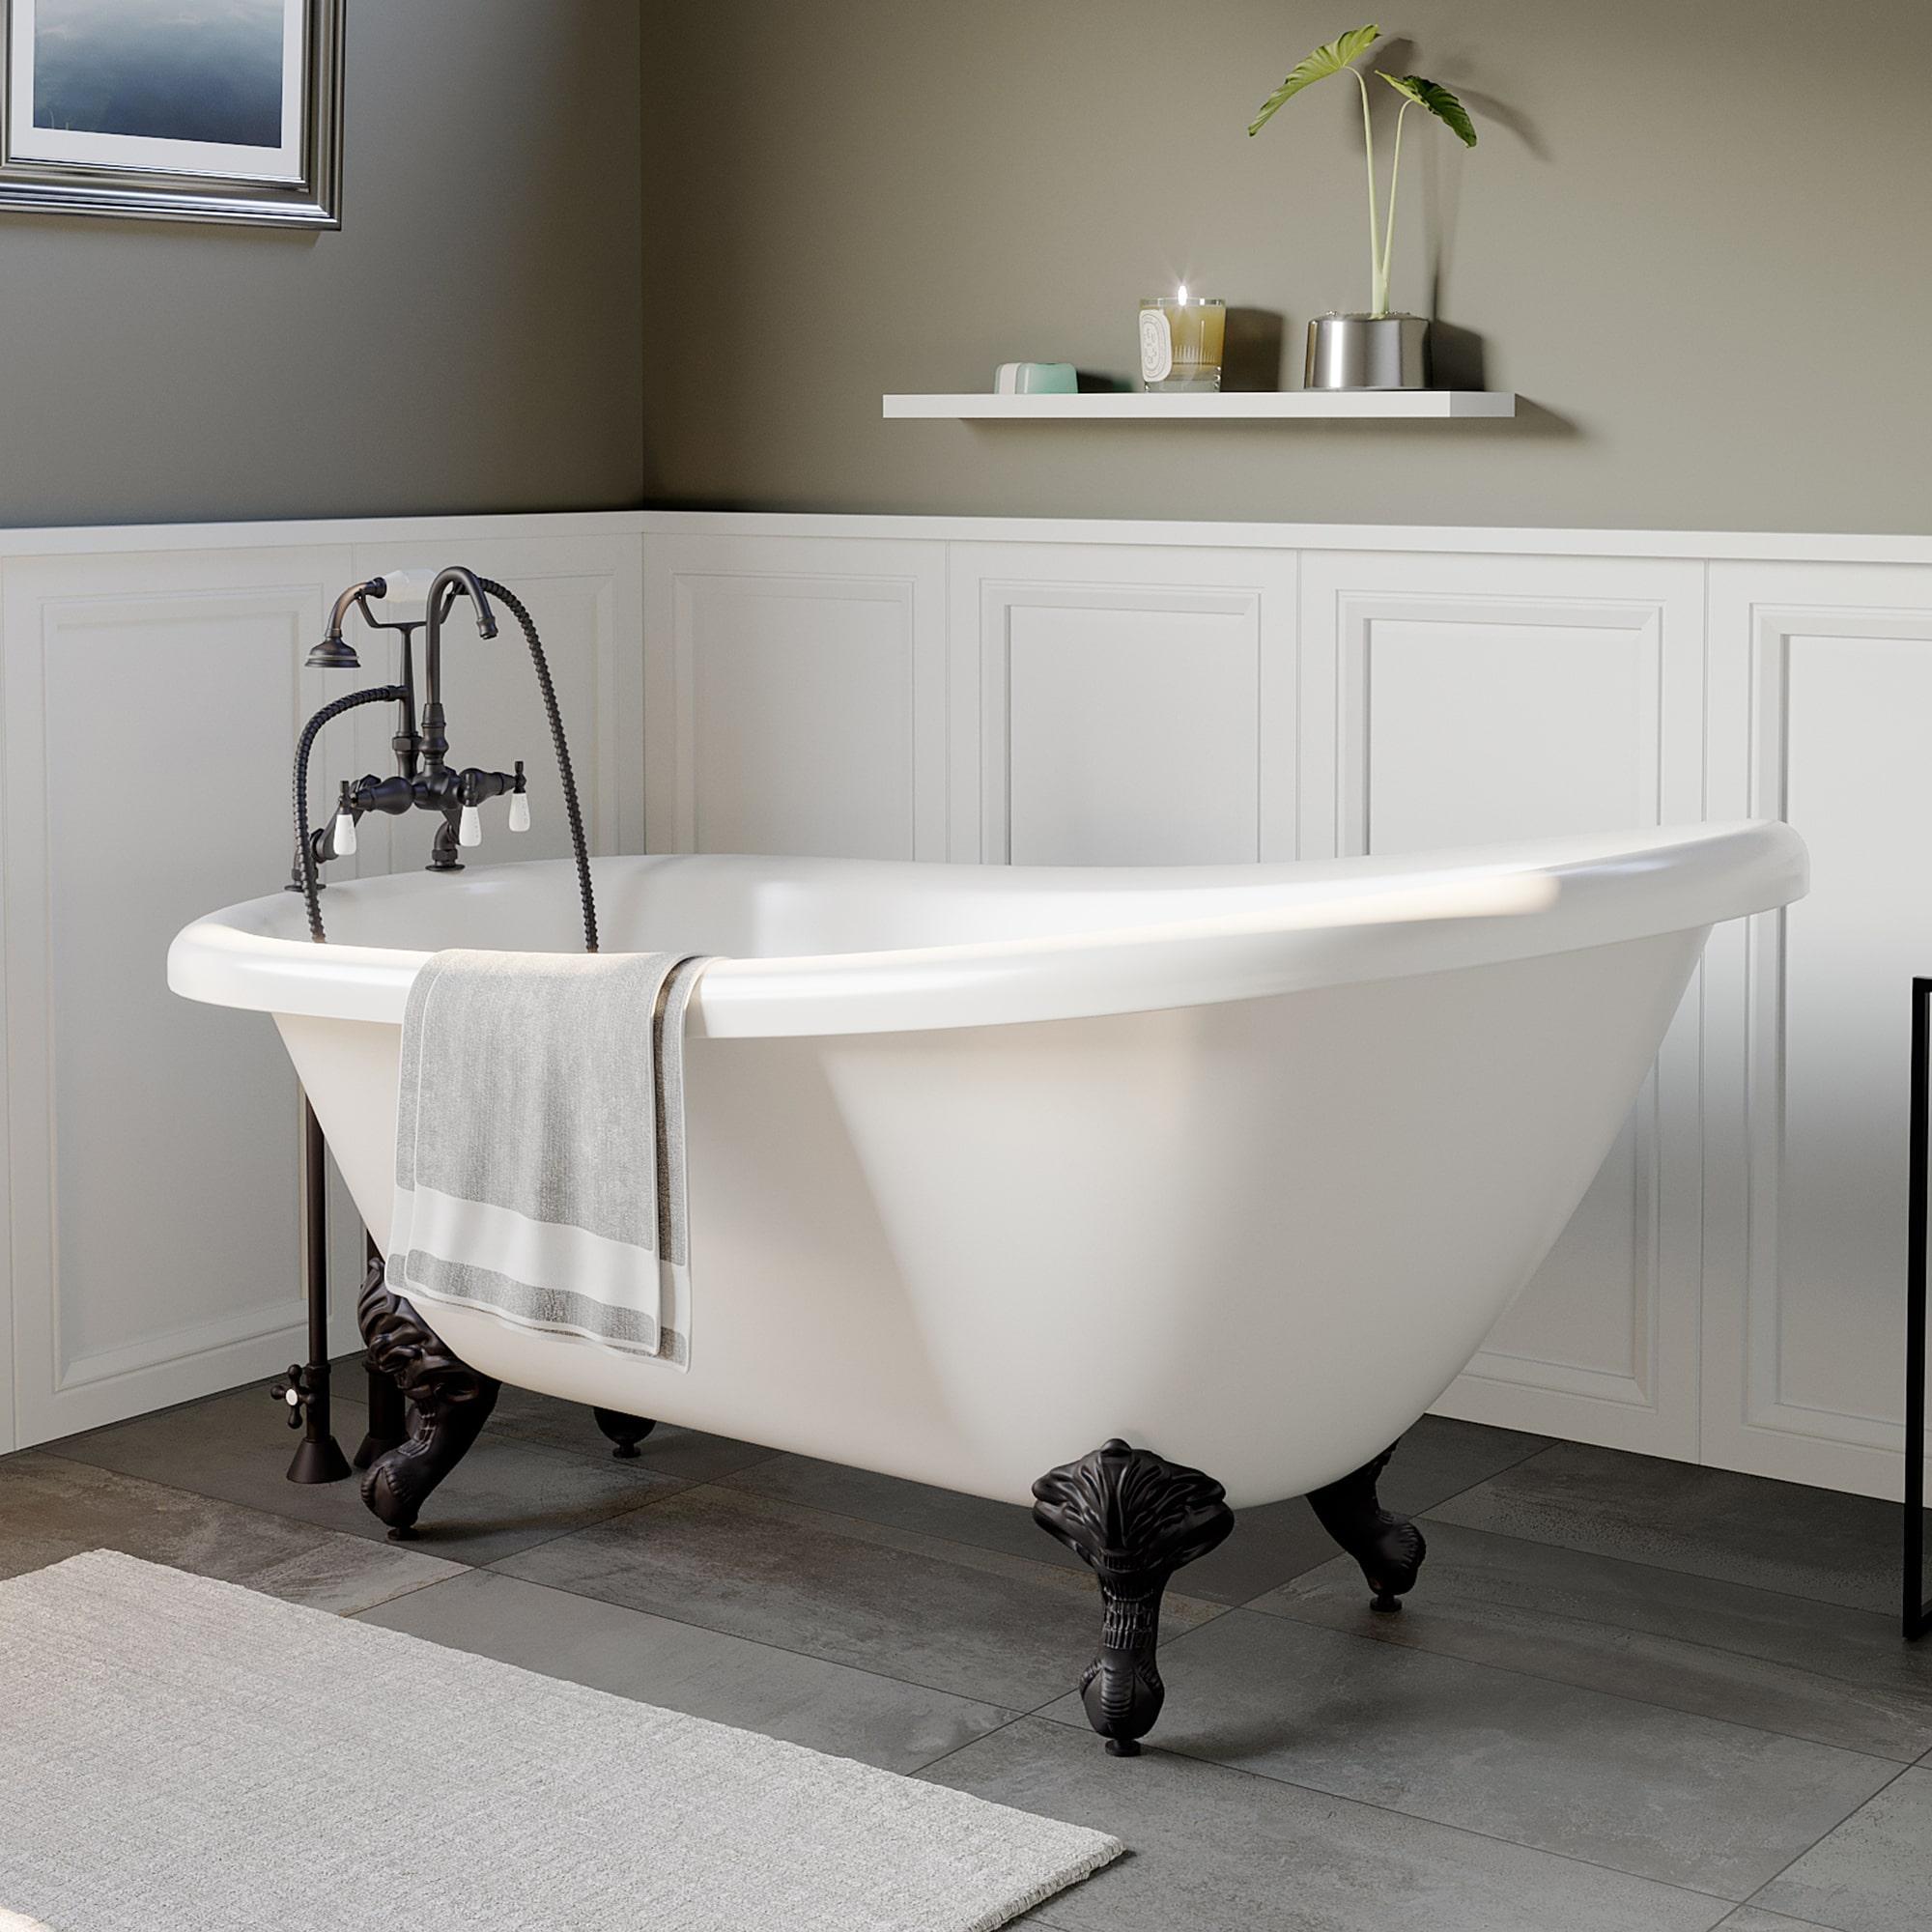 slipper tub, tub and faucet package, clawfoot tub,